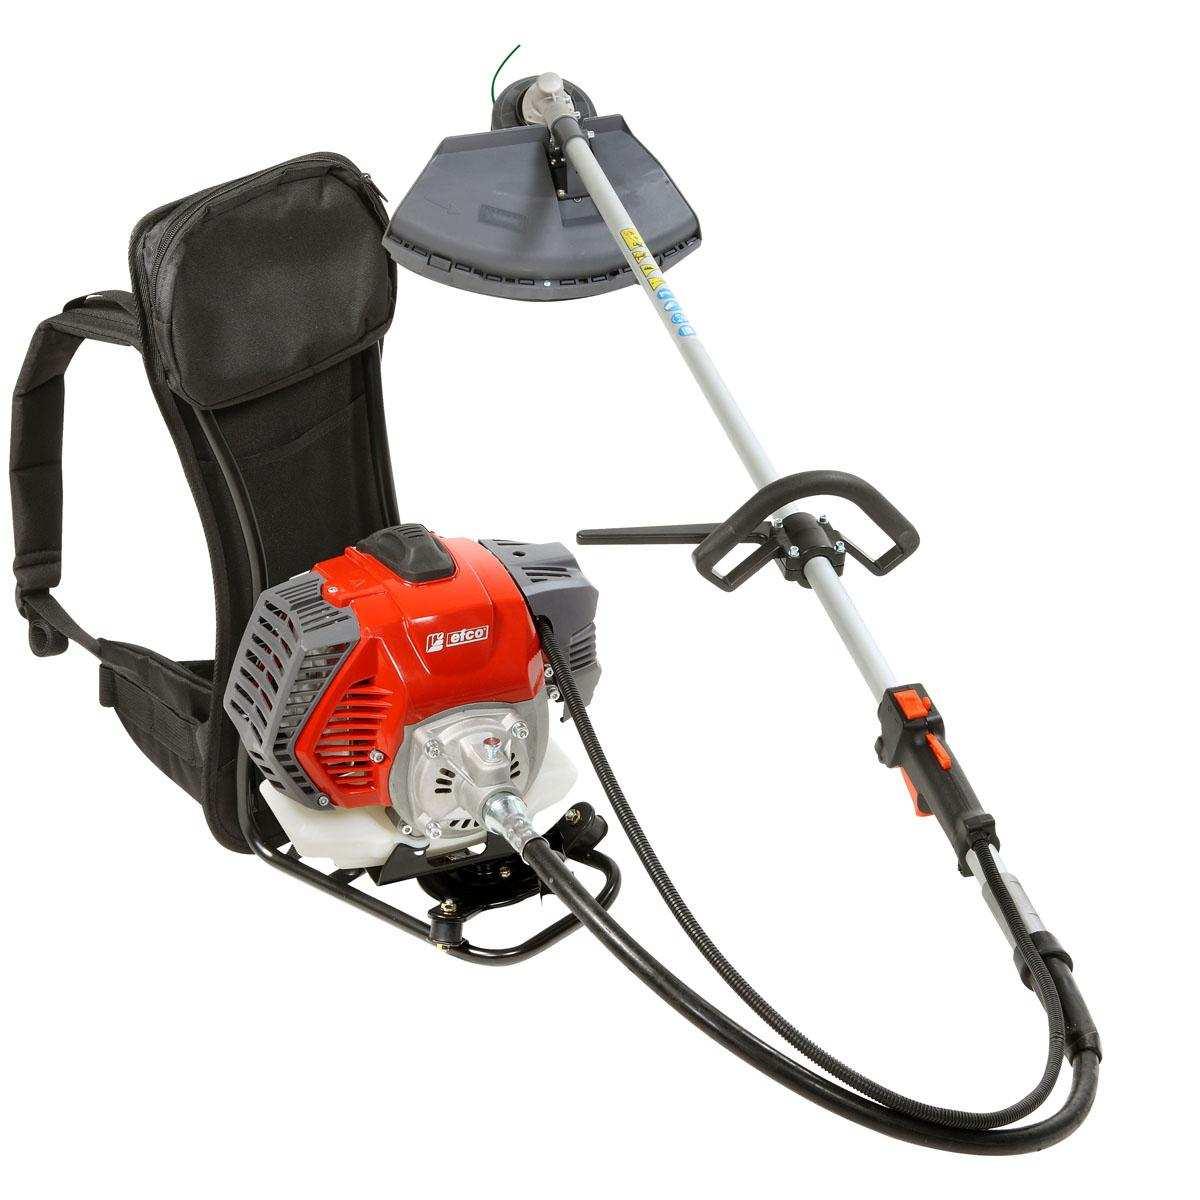 Efco DSH 400 BP Motorlu Sırt Tırpan 2 HP